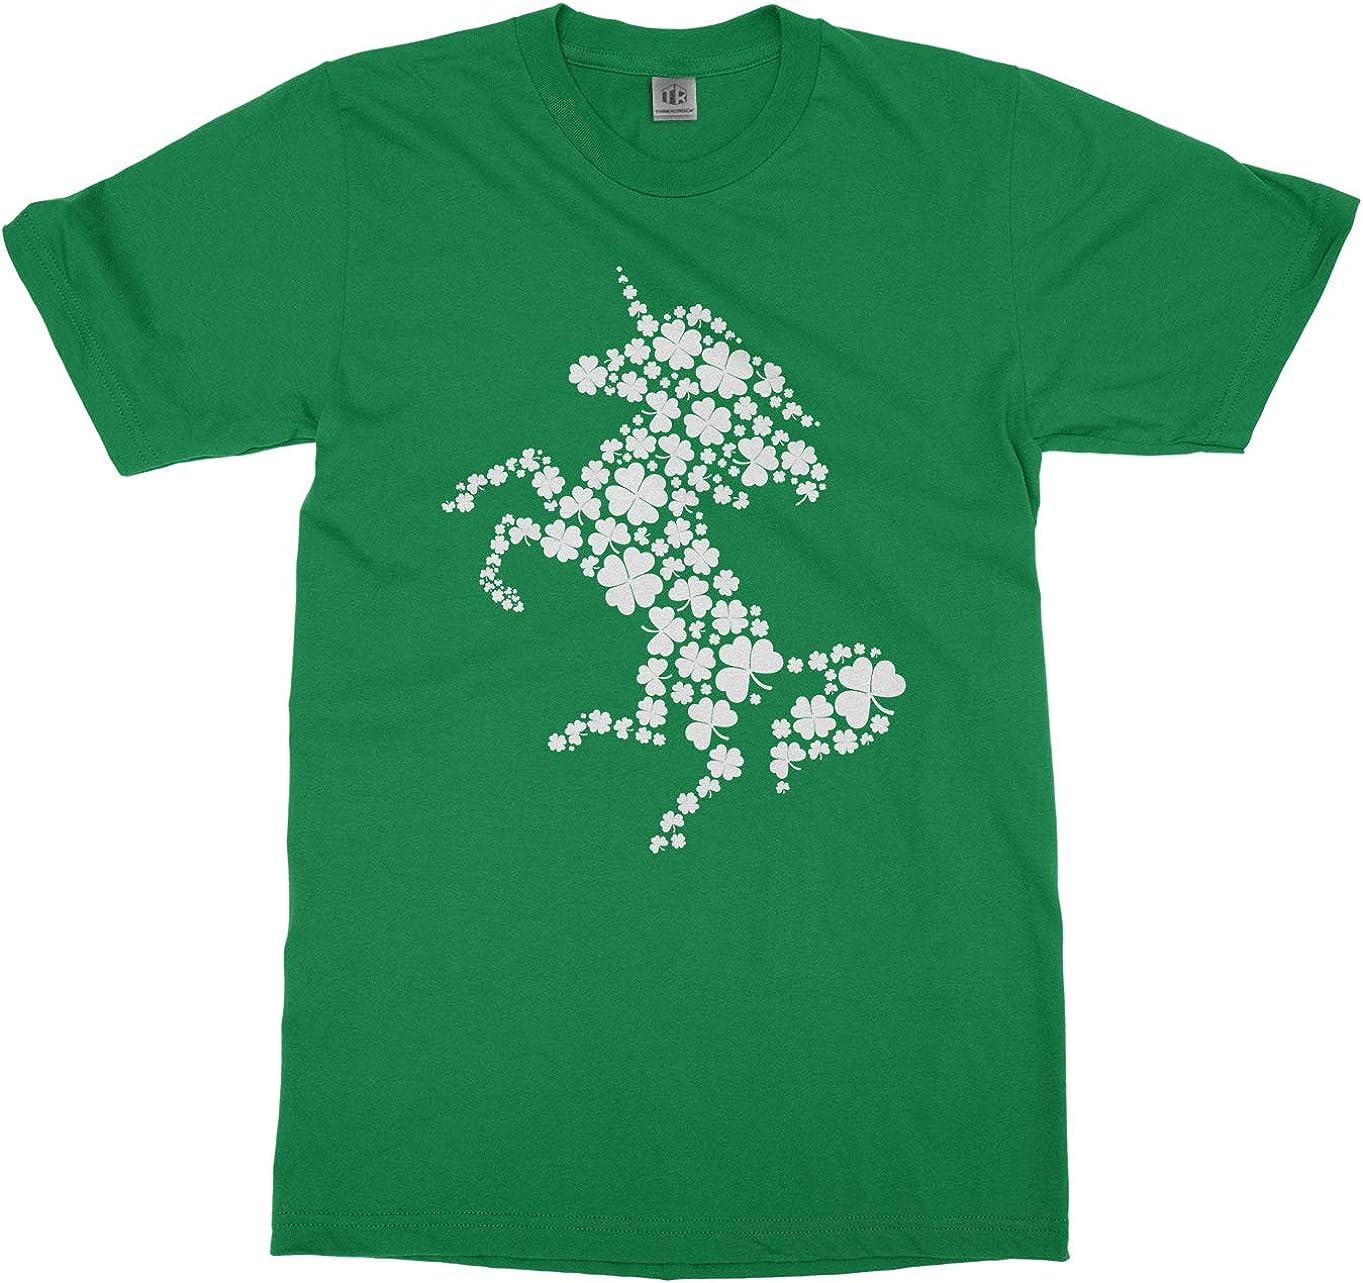 Patricks Day Unicorn Face Short-Sleeve T-Shirt Baby Boys St